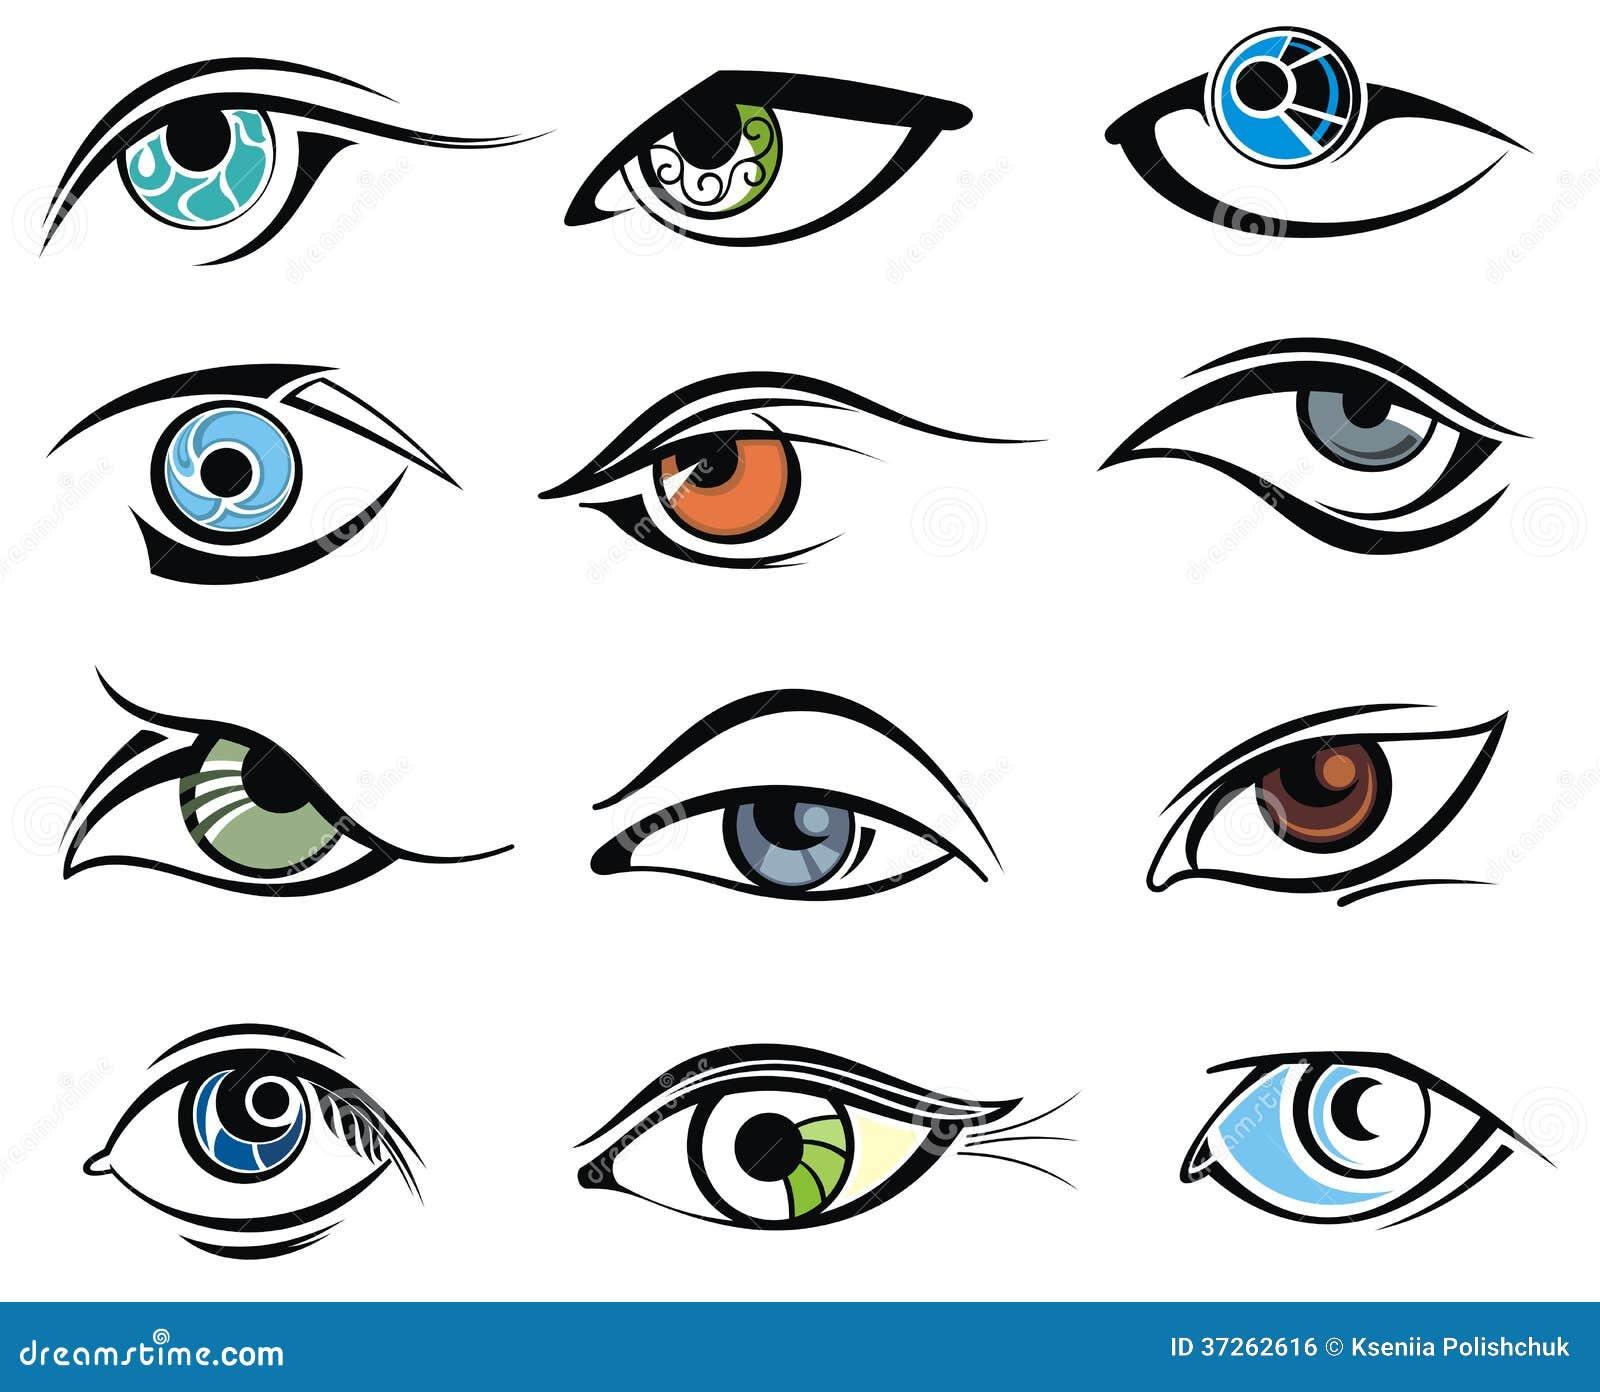 Character Design Eyes : Character set eyes royalty free stock image